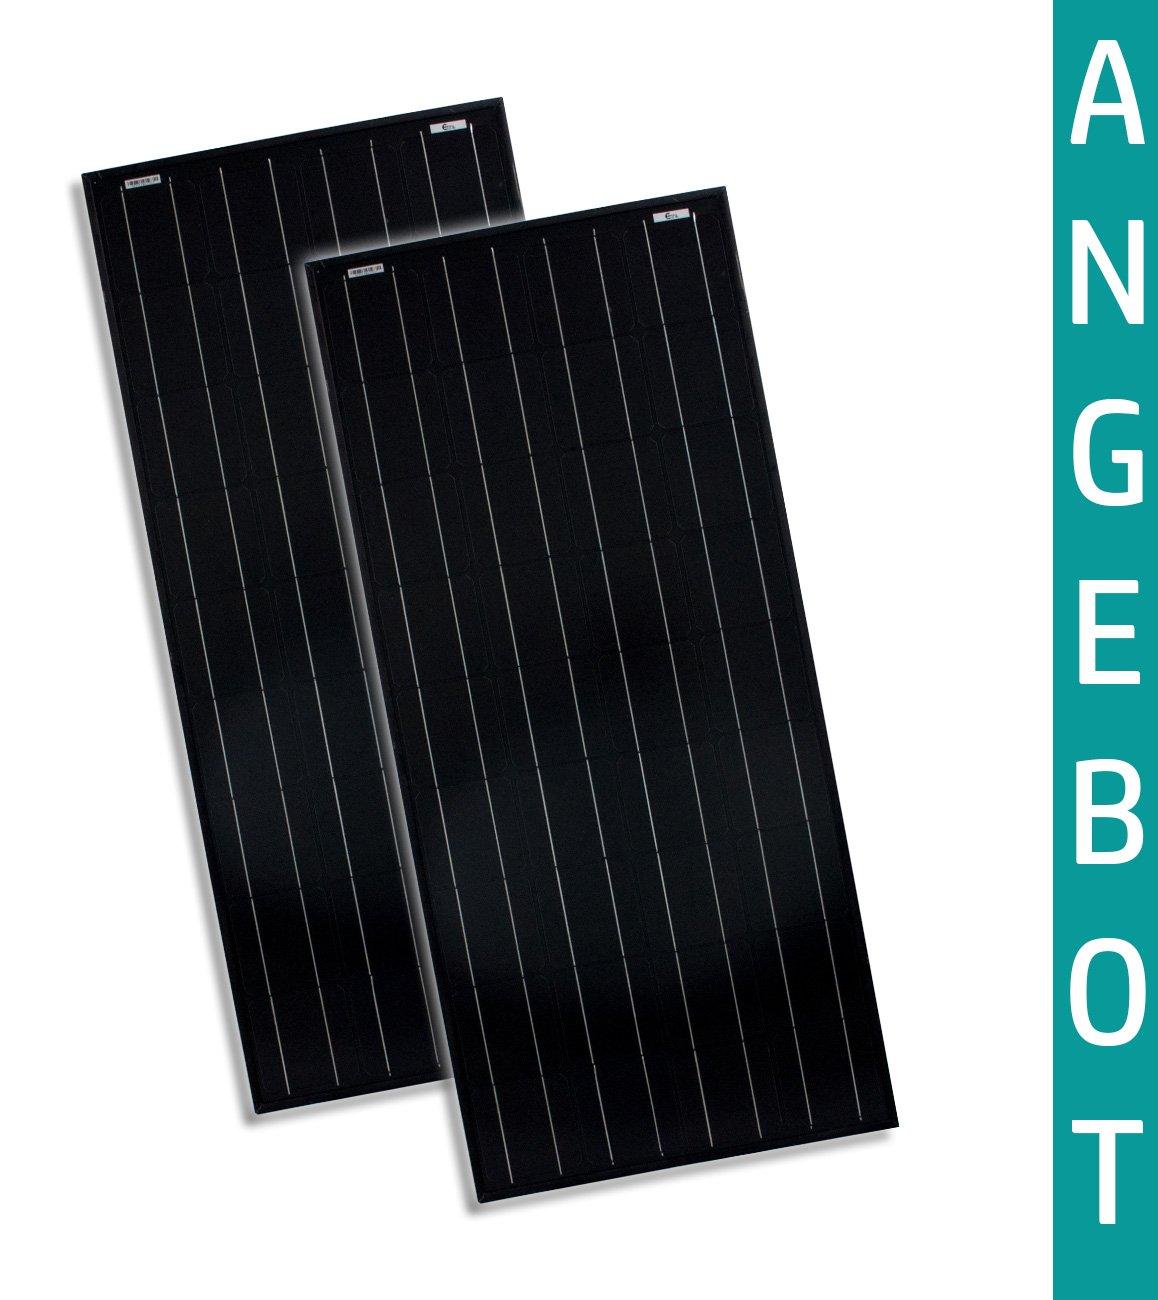 100W Watt x2 - Doppelpack Solarmodule Monokristallin Full Black 12V Volt TÜV zertifiziert - Solarpanel - Solar - Camping - solarXXL